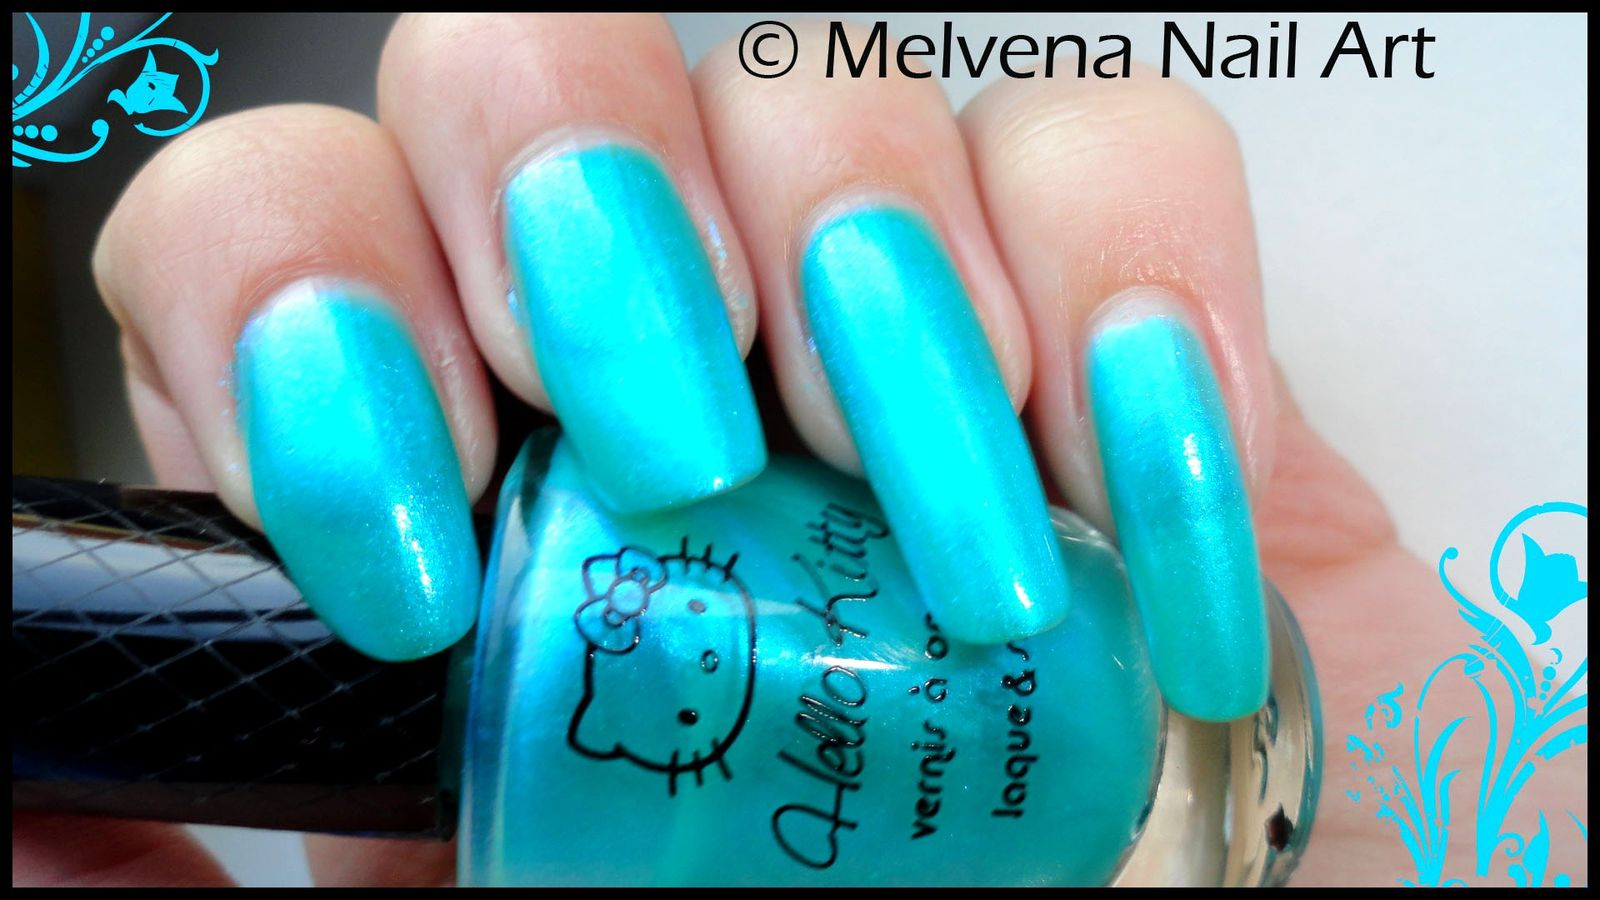 Connu Vernis Hello Kitty Bleu turquoise - Le blog de melvenailart.over  IP42